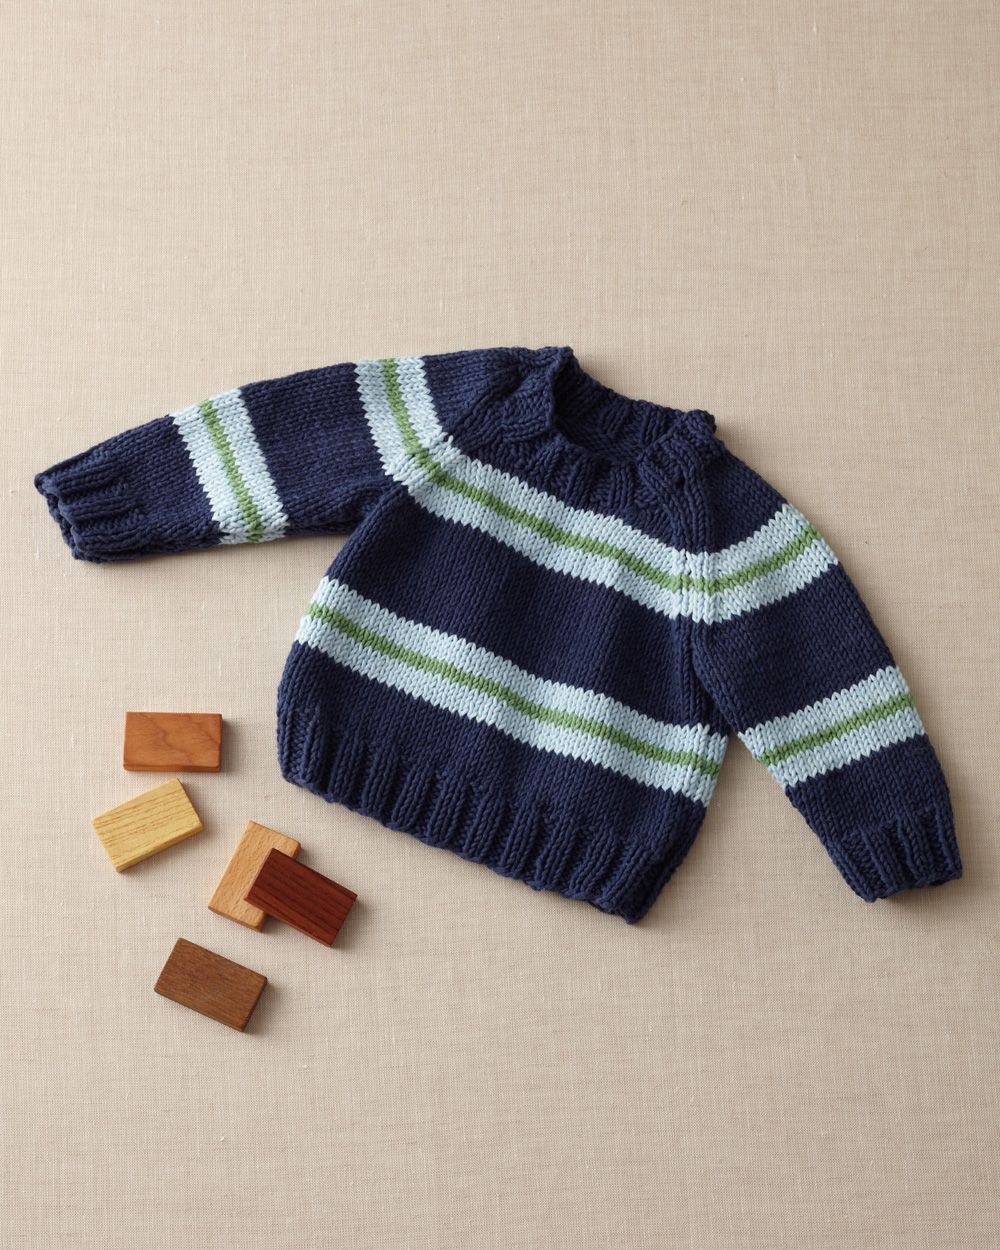 Free+Knitting+Pattern+-+Baby+Sweaters:+Crewneck+Baby+Sweater | Baby ...